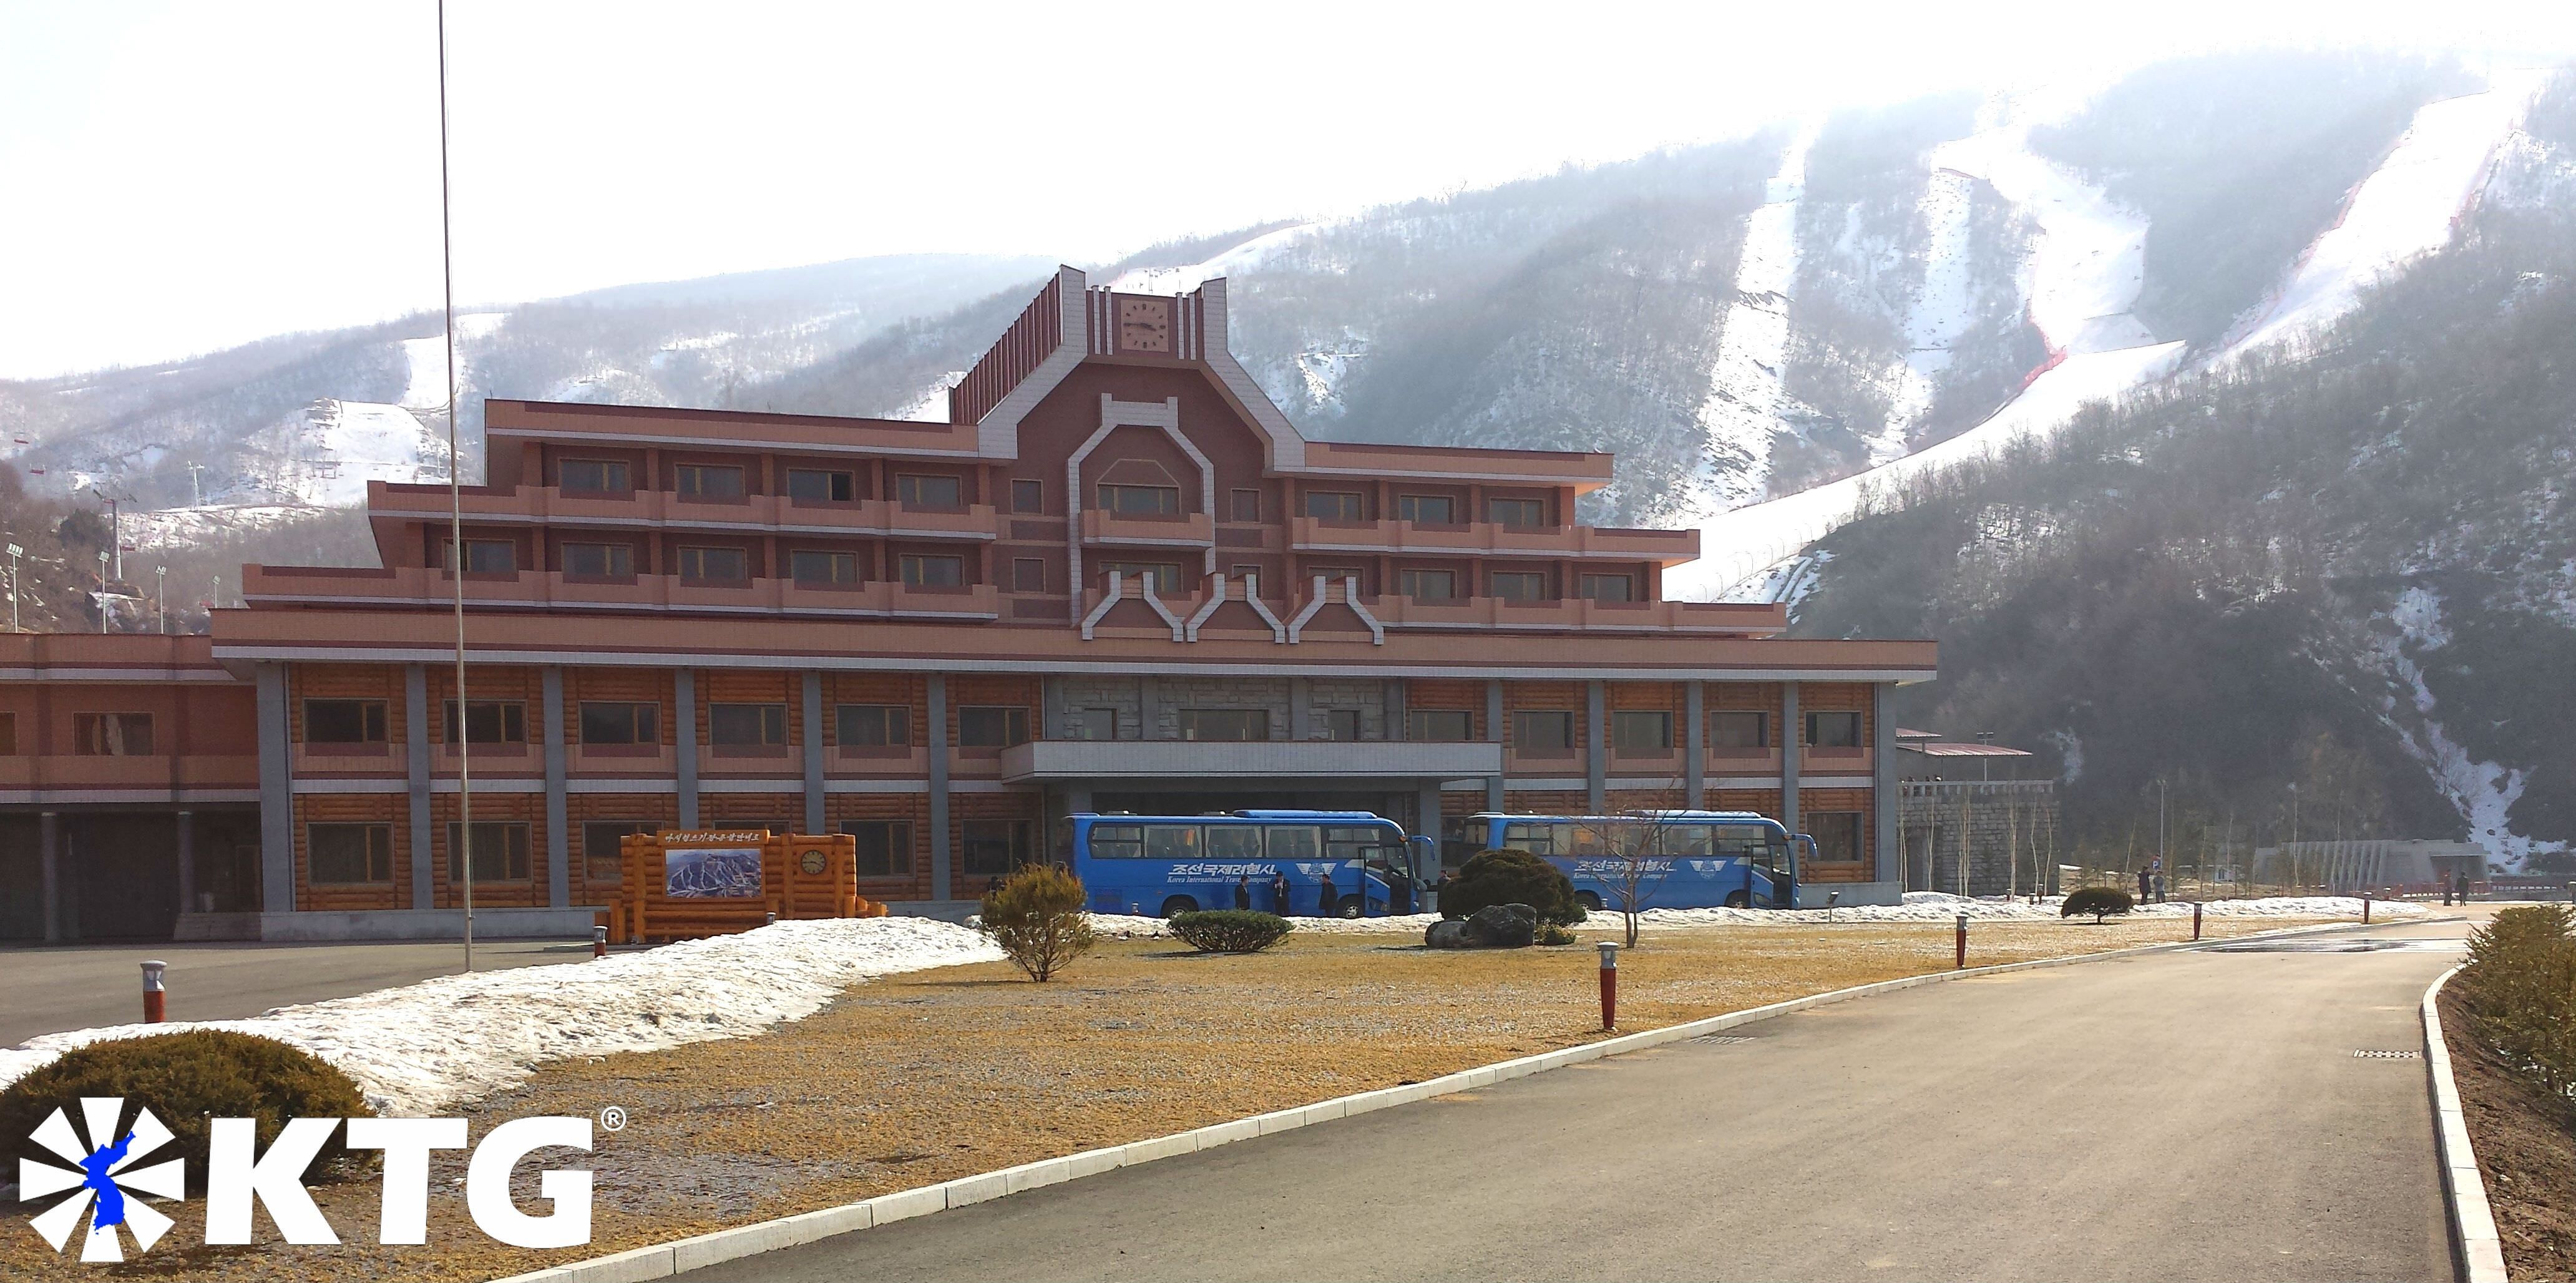 Masik ski resort in North Korea, DPRK, in March. Trip arranged by KTG Tours